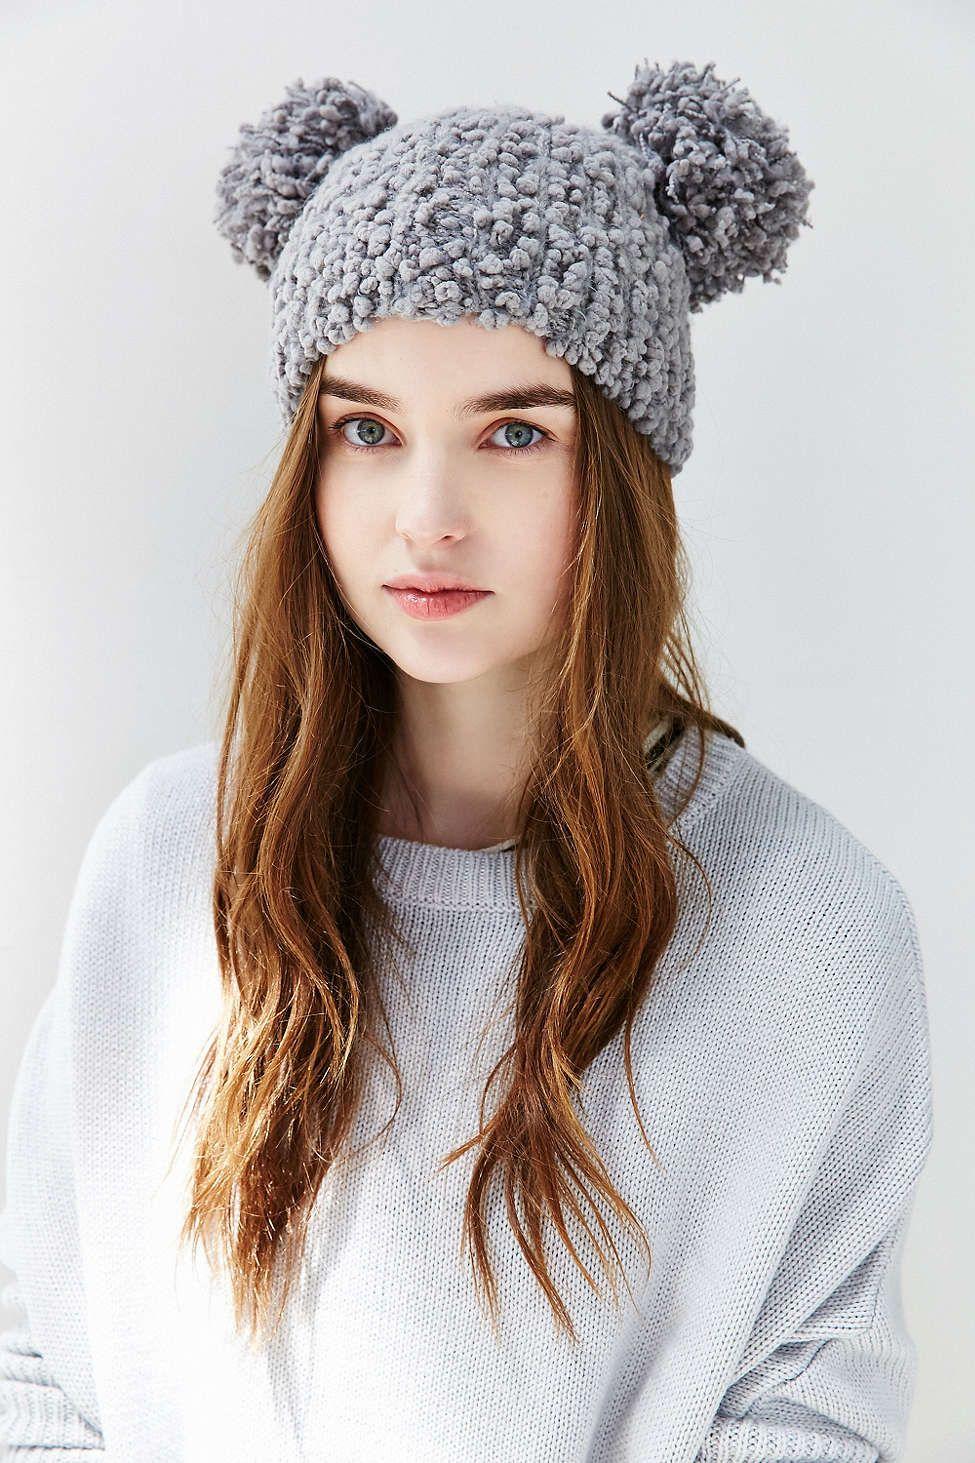 Women s Winter Trendy Warm knit Beanie Hat with Pom Pom Ears (Beige).  Animal Ears Beanie  UrbanOutfitters ebcaba3eaa1b